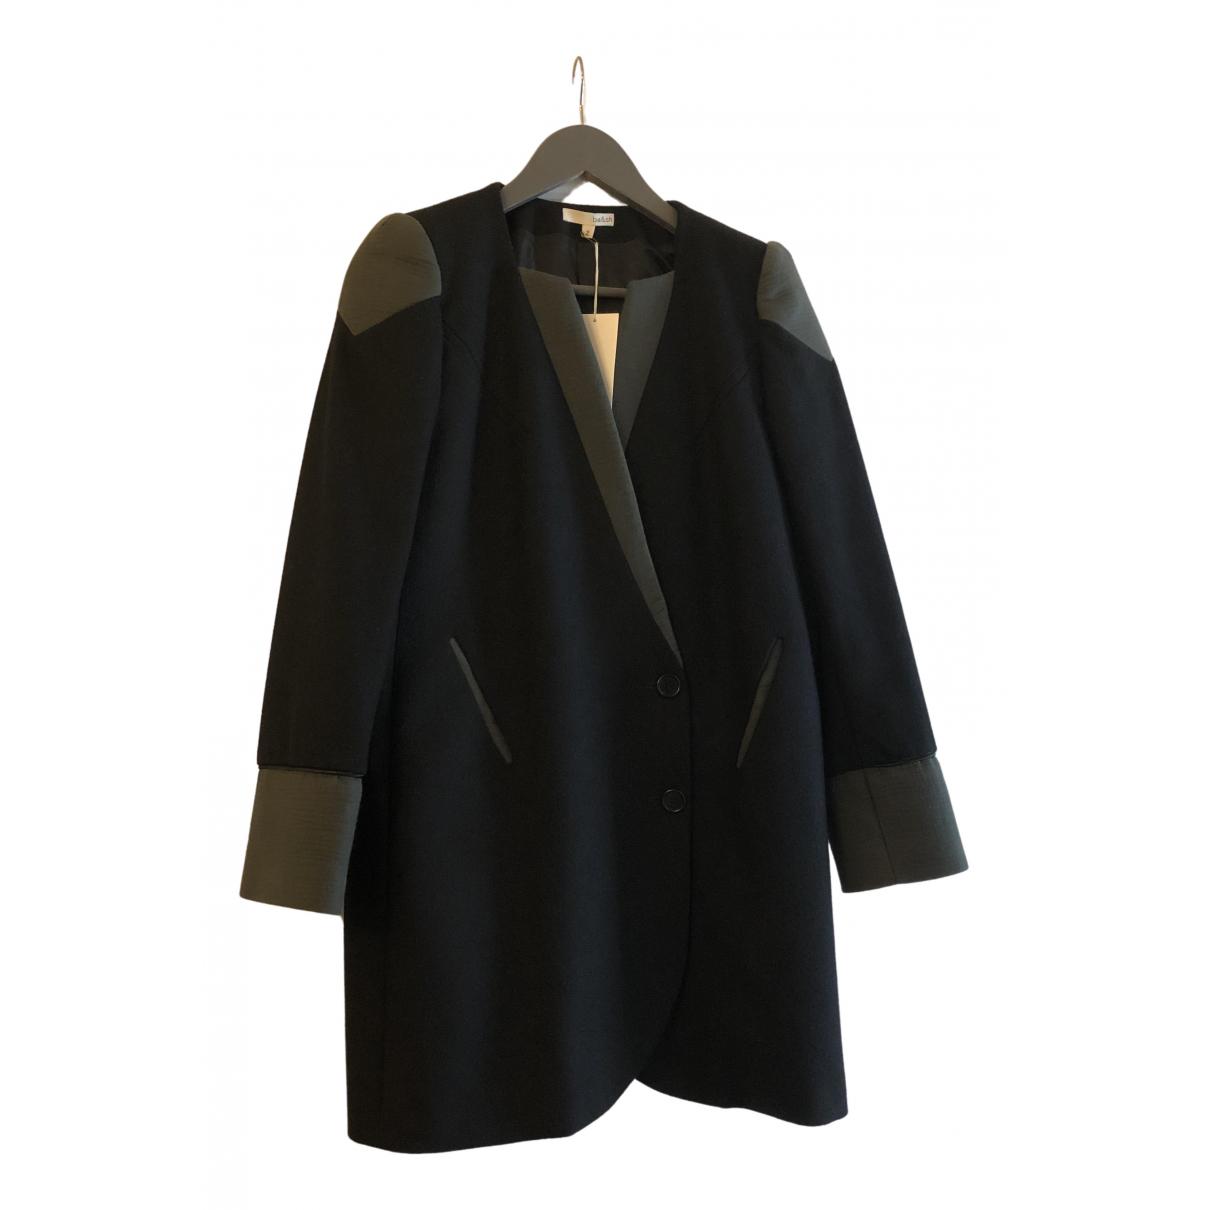 Ba&sh \N Black Wool coat for Women 38 FR